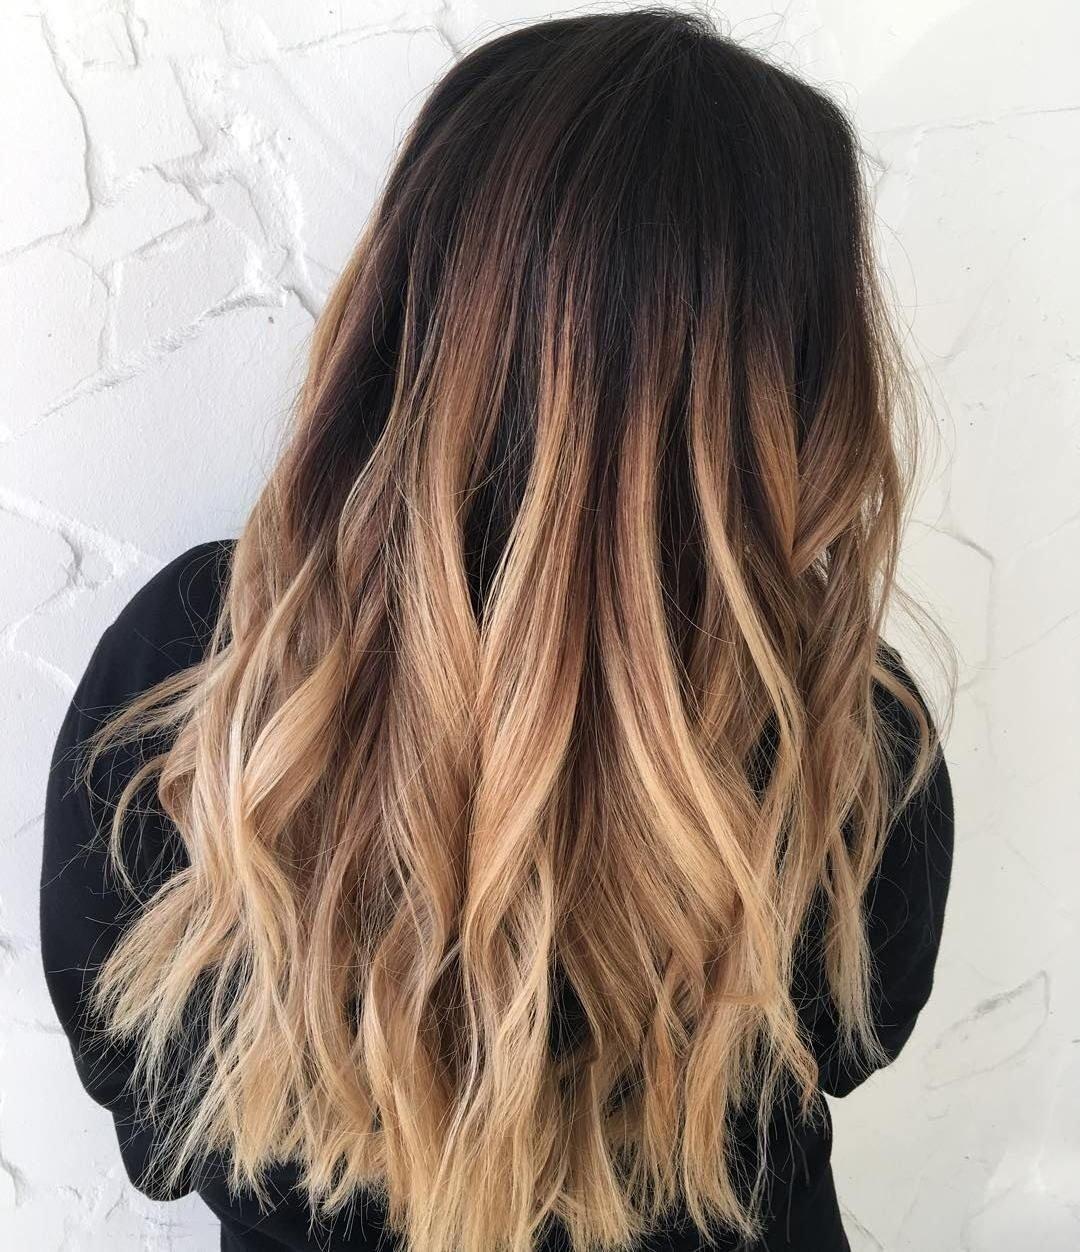 10 Best Blonde And Black Hair Color Ideas 60 best ombre hair color ideas for blond brown red and black hair 14 2020